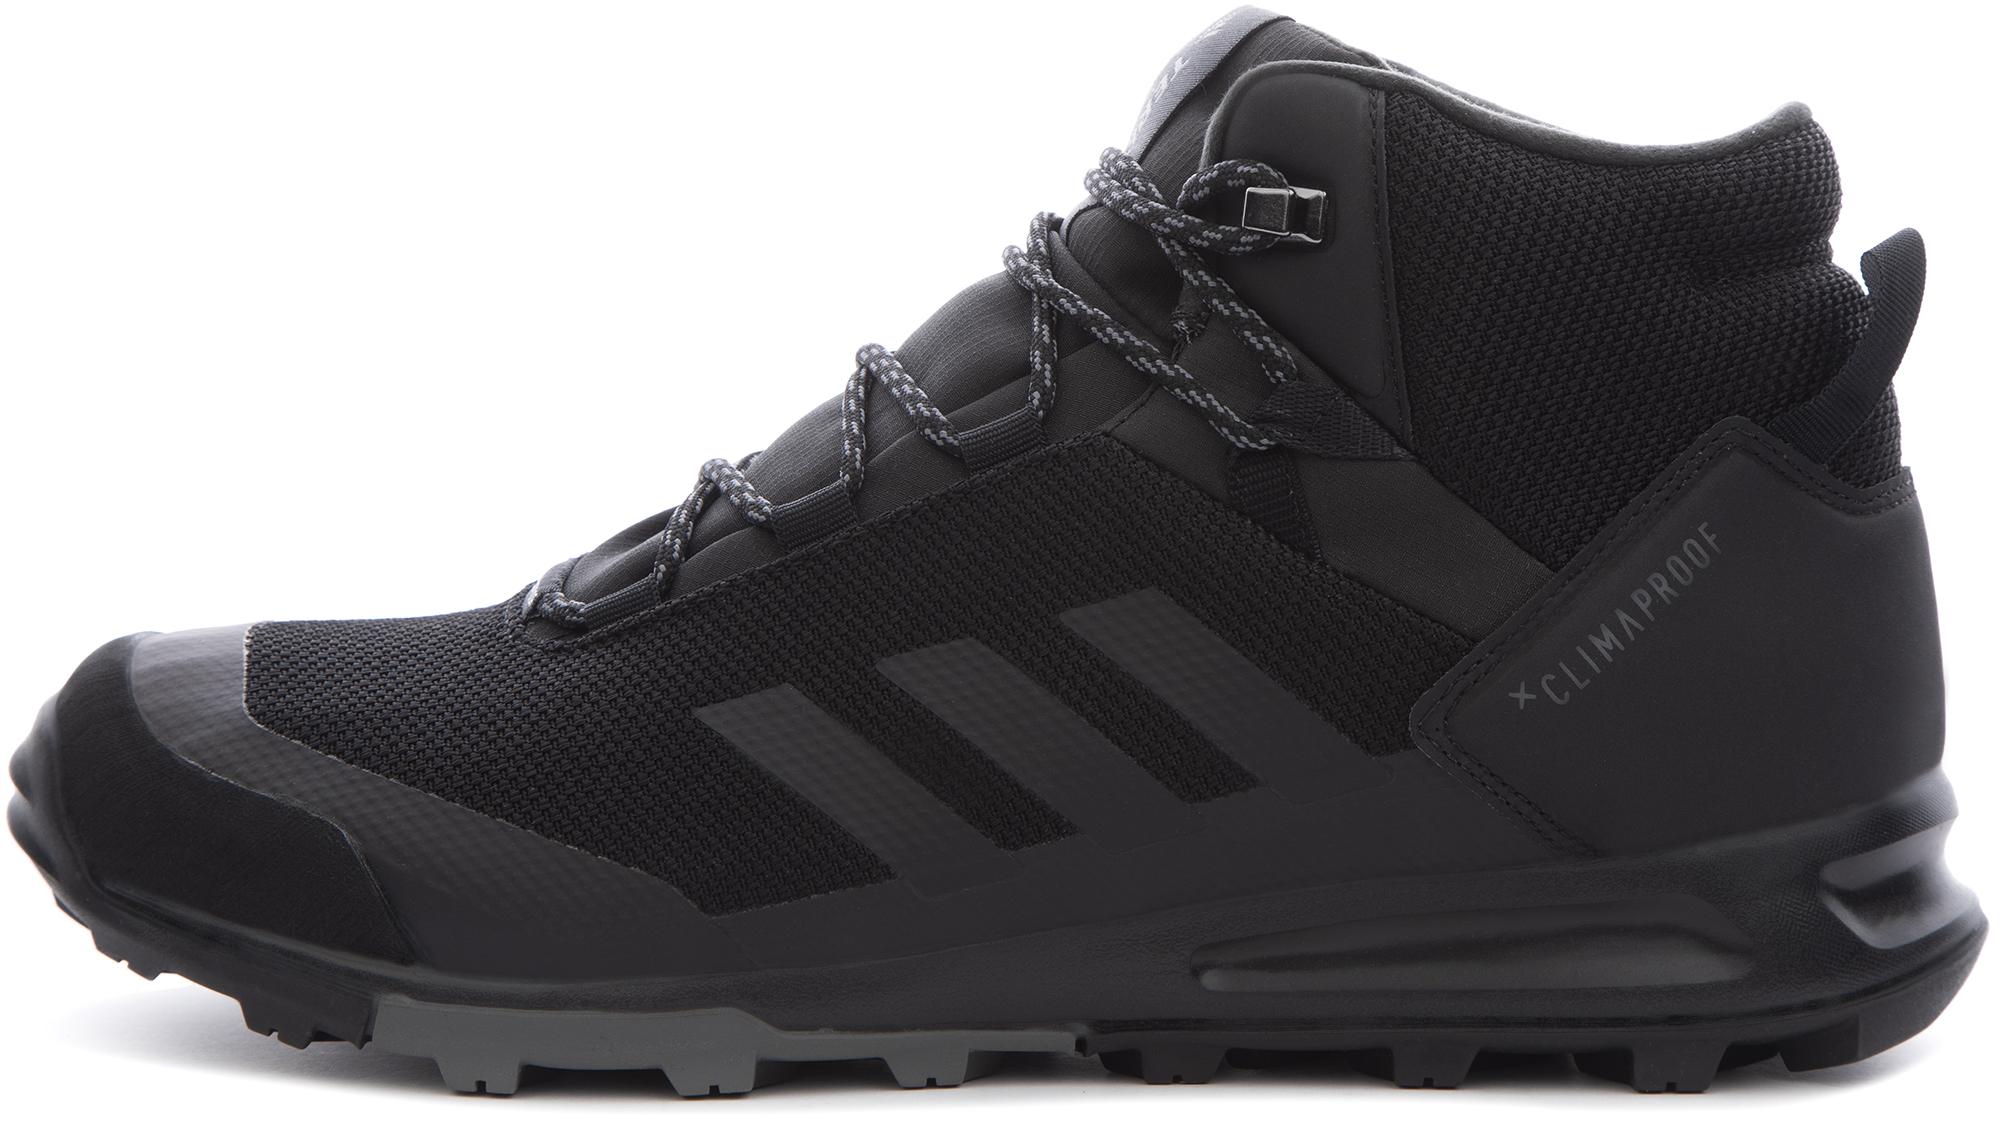 Adidas Ботинки мужские Adidas Terrex Tivid, размер 45 цена